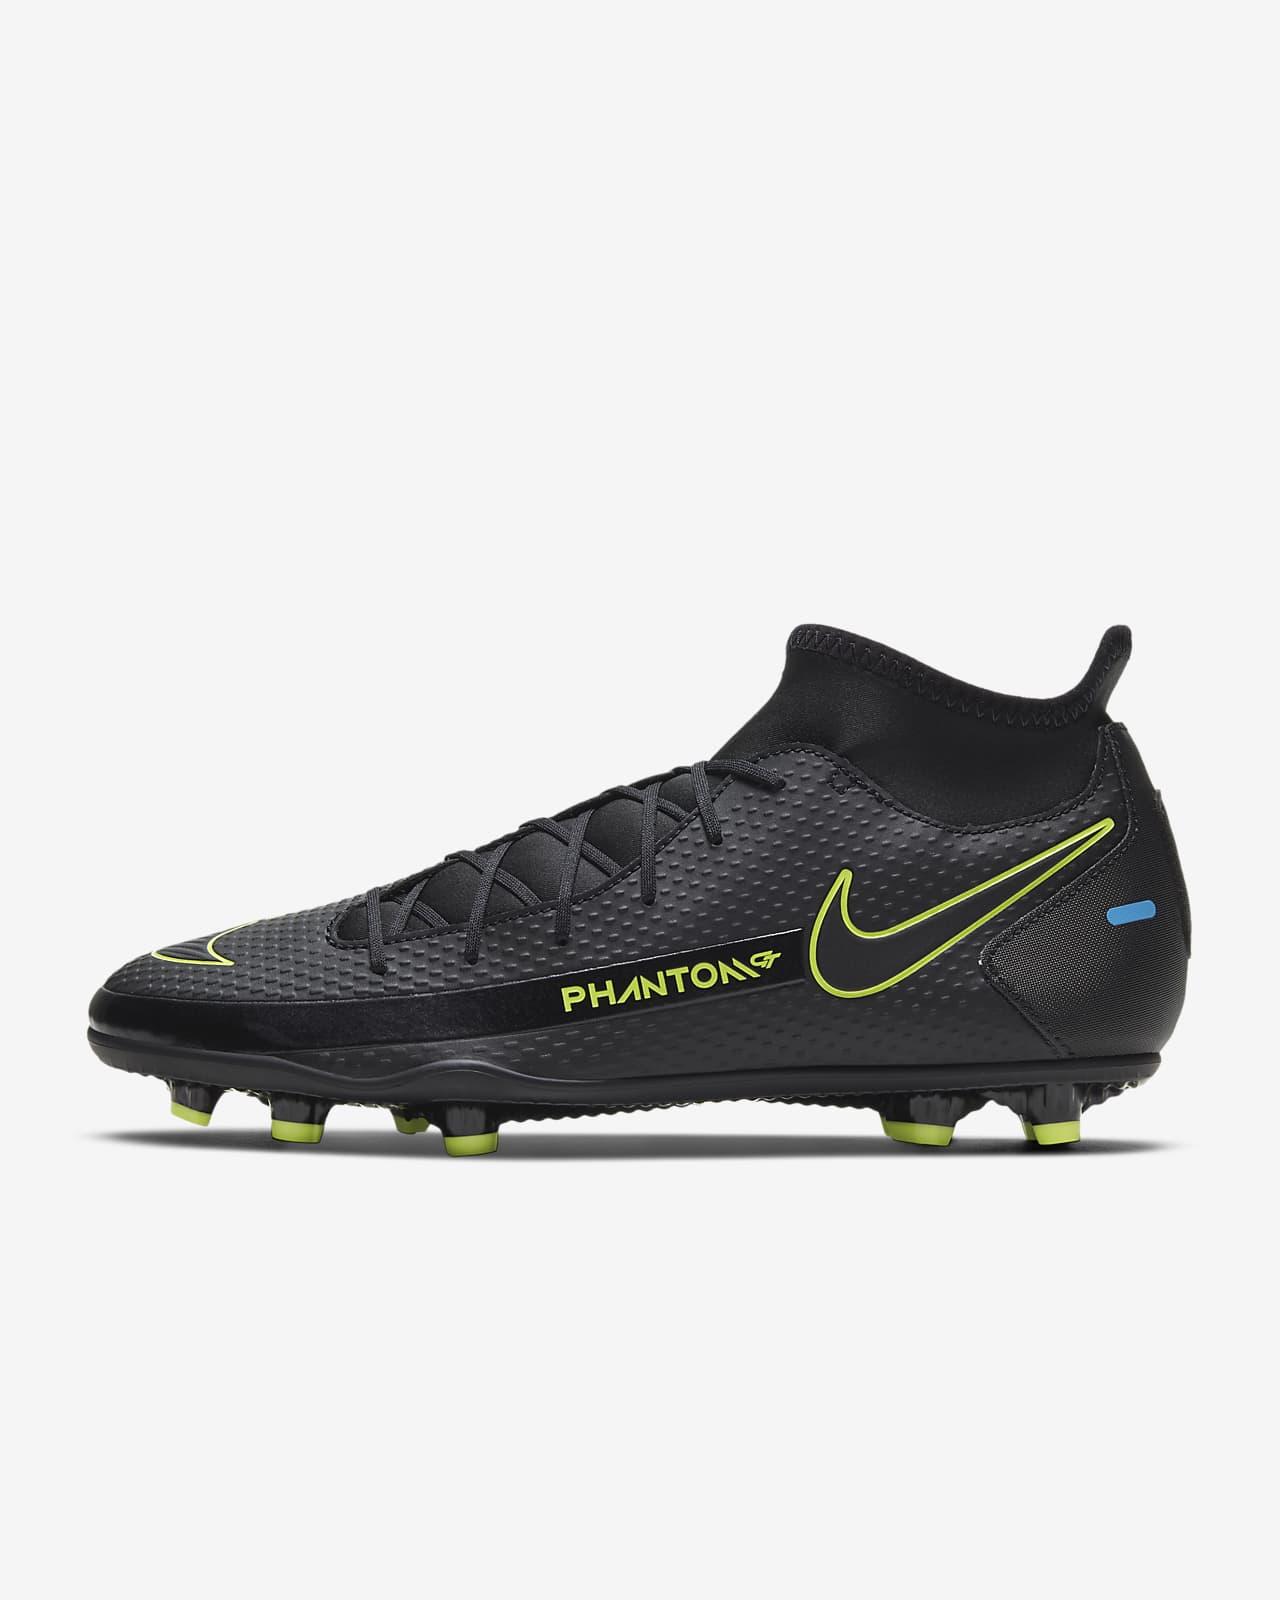 Nike Phantom GT Club Dynamic Fit MG Multi-Ground Soccer Cleat